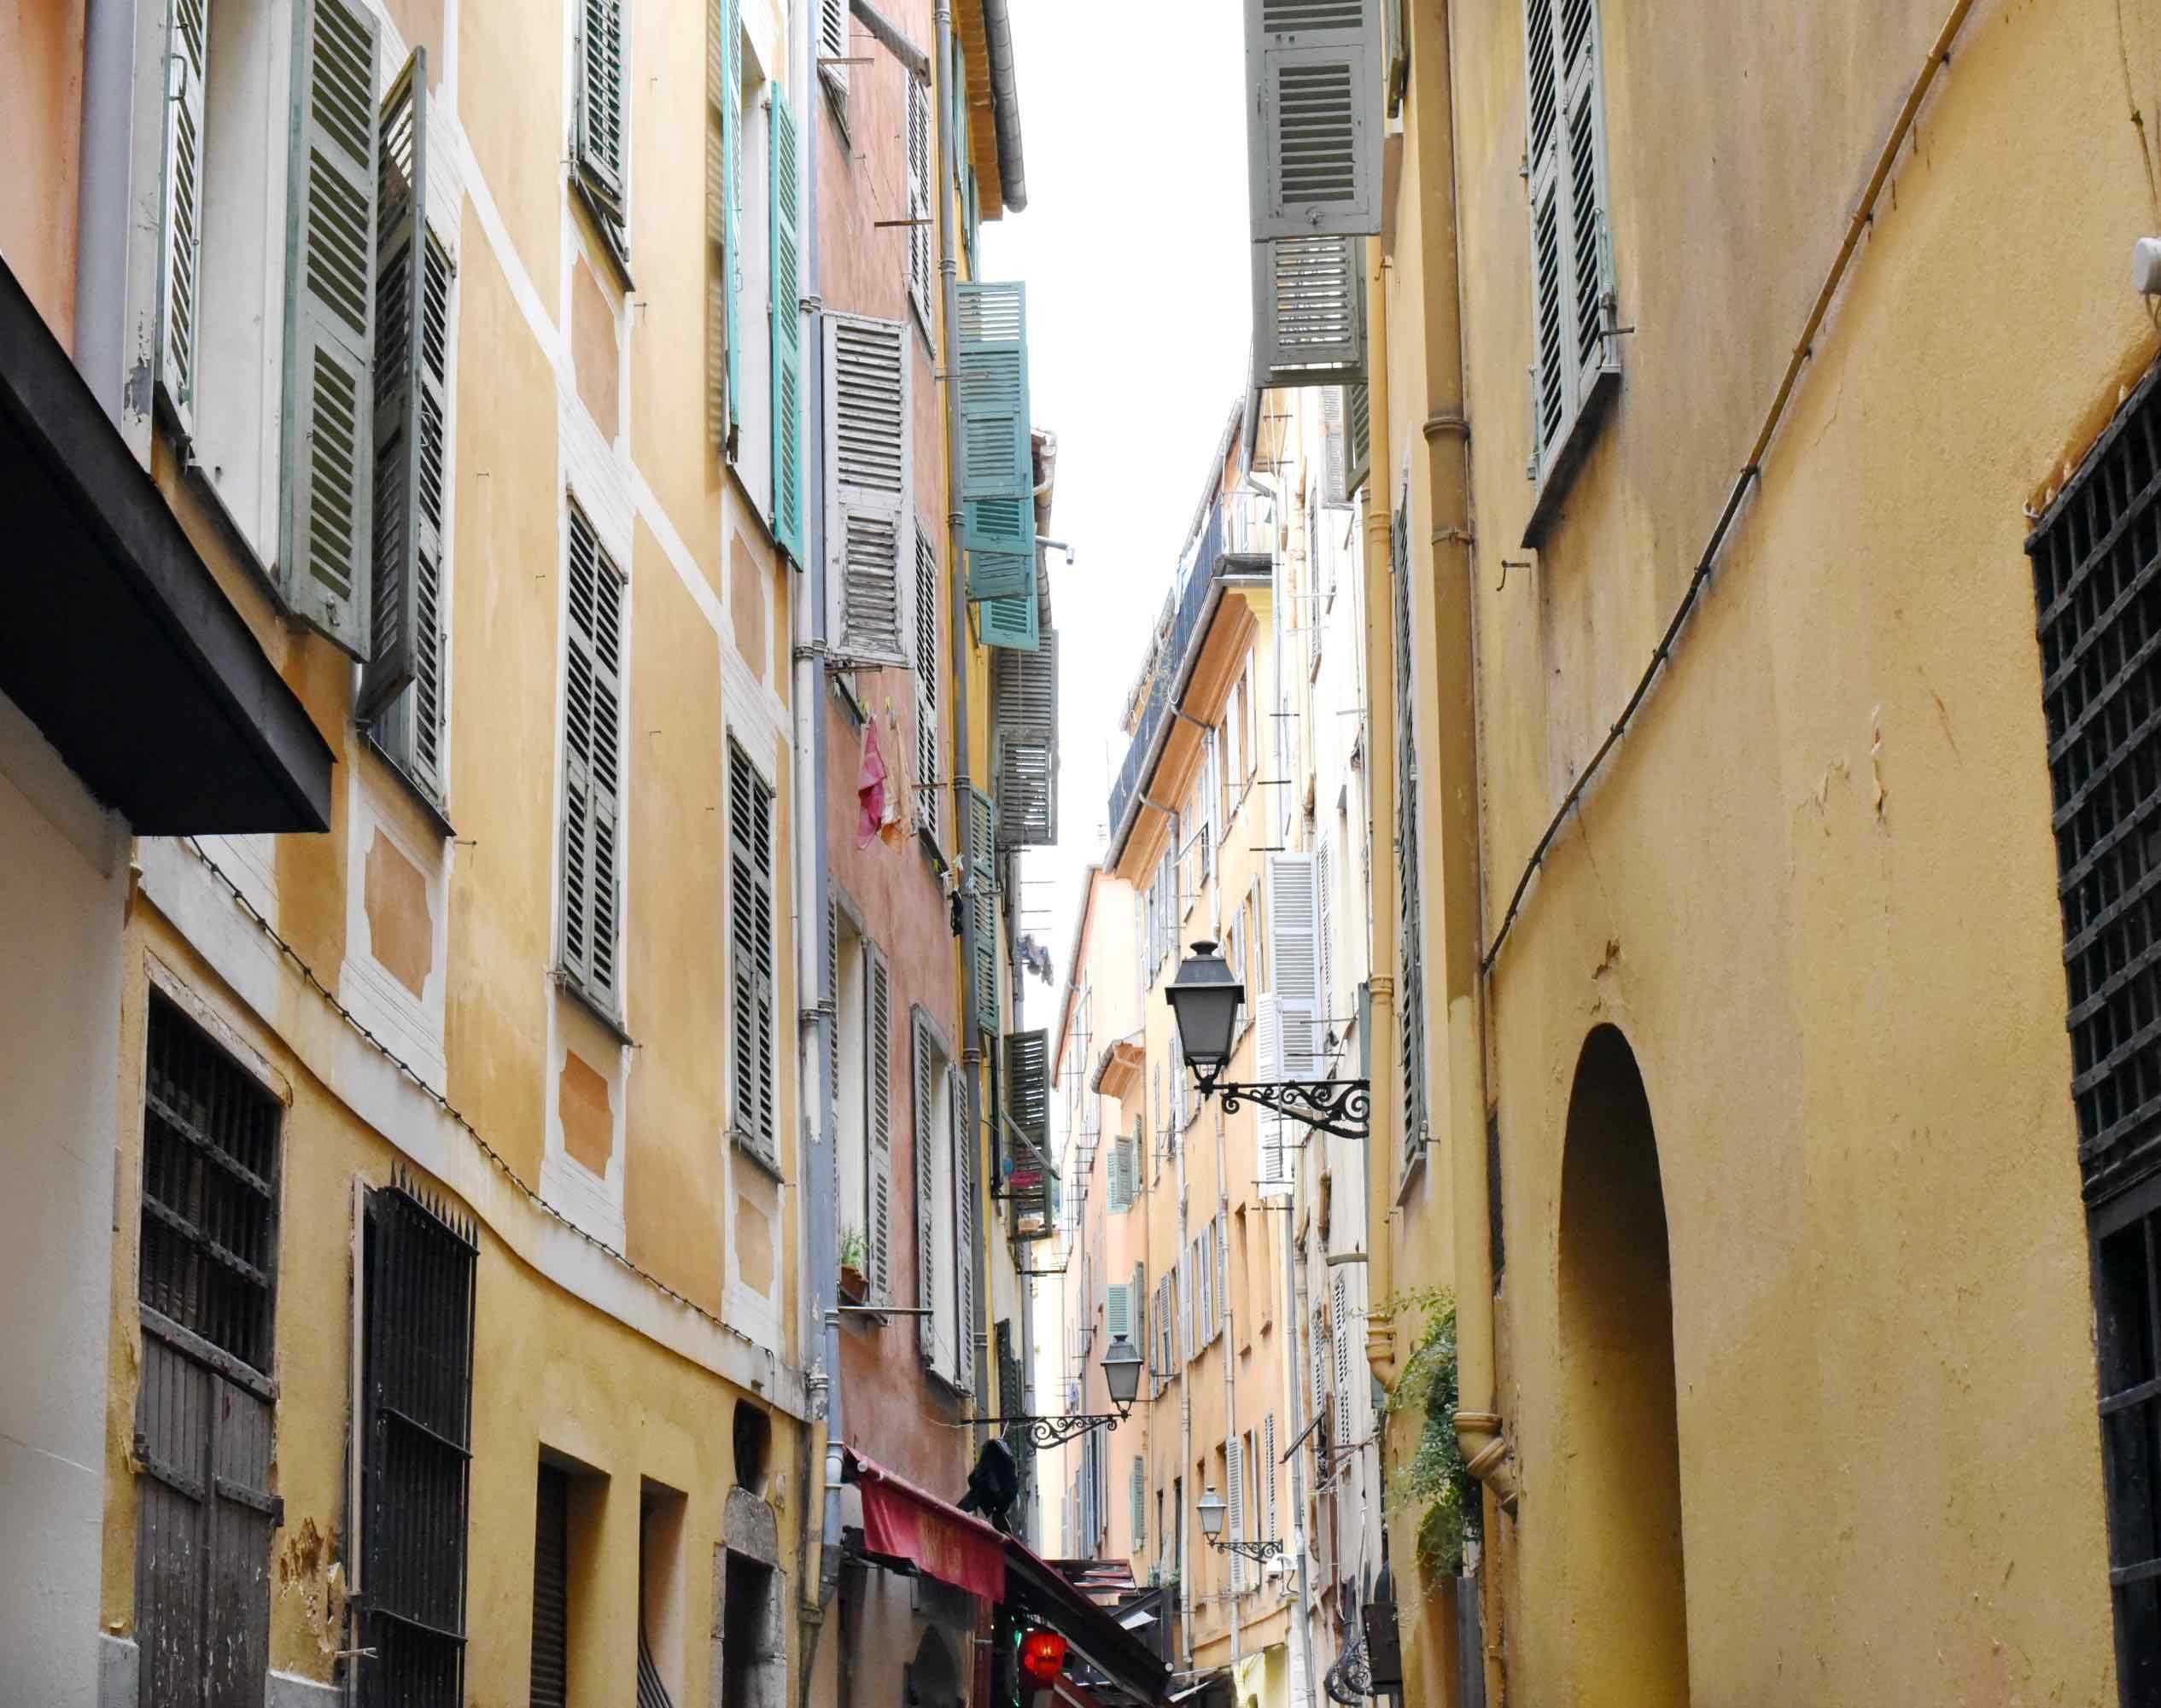 Nice-Tight-Streets